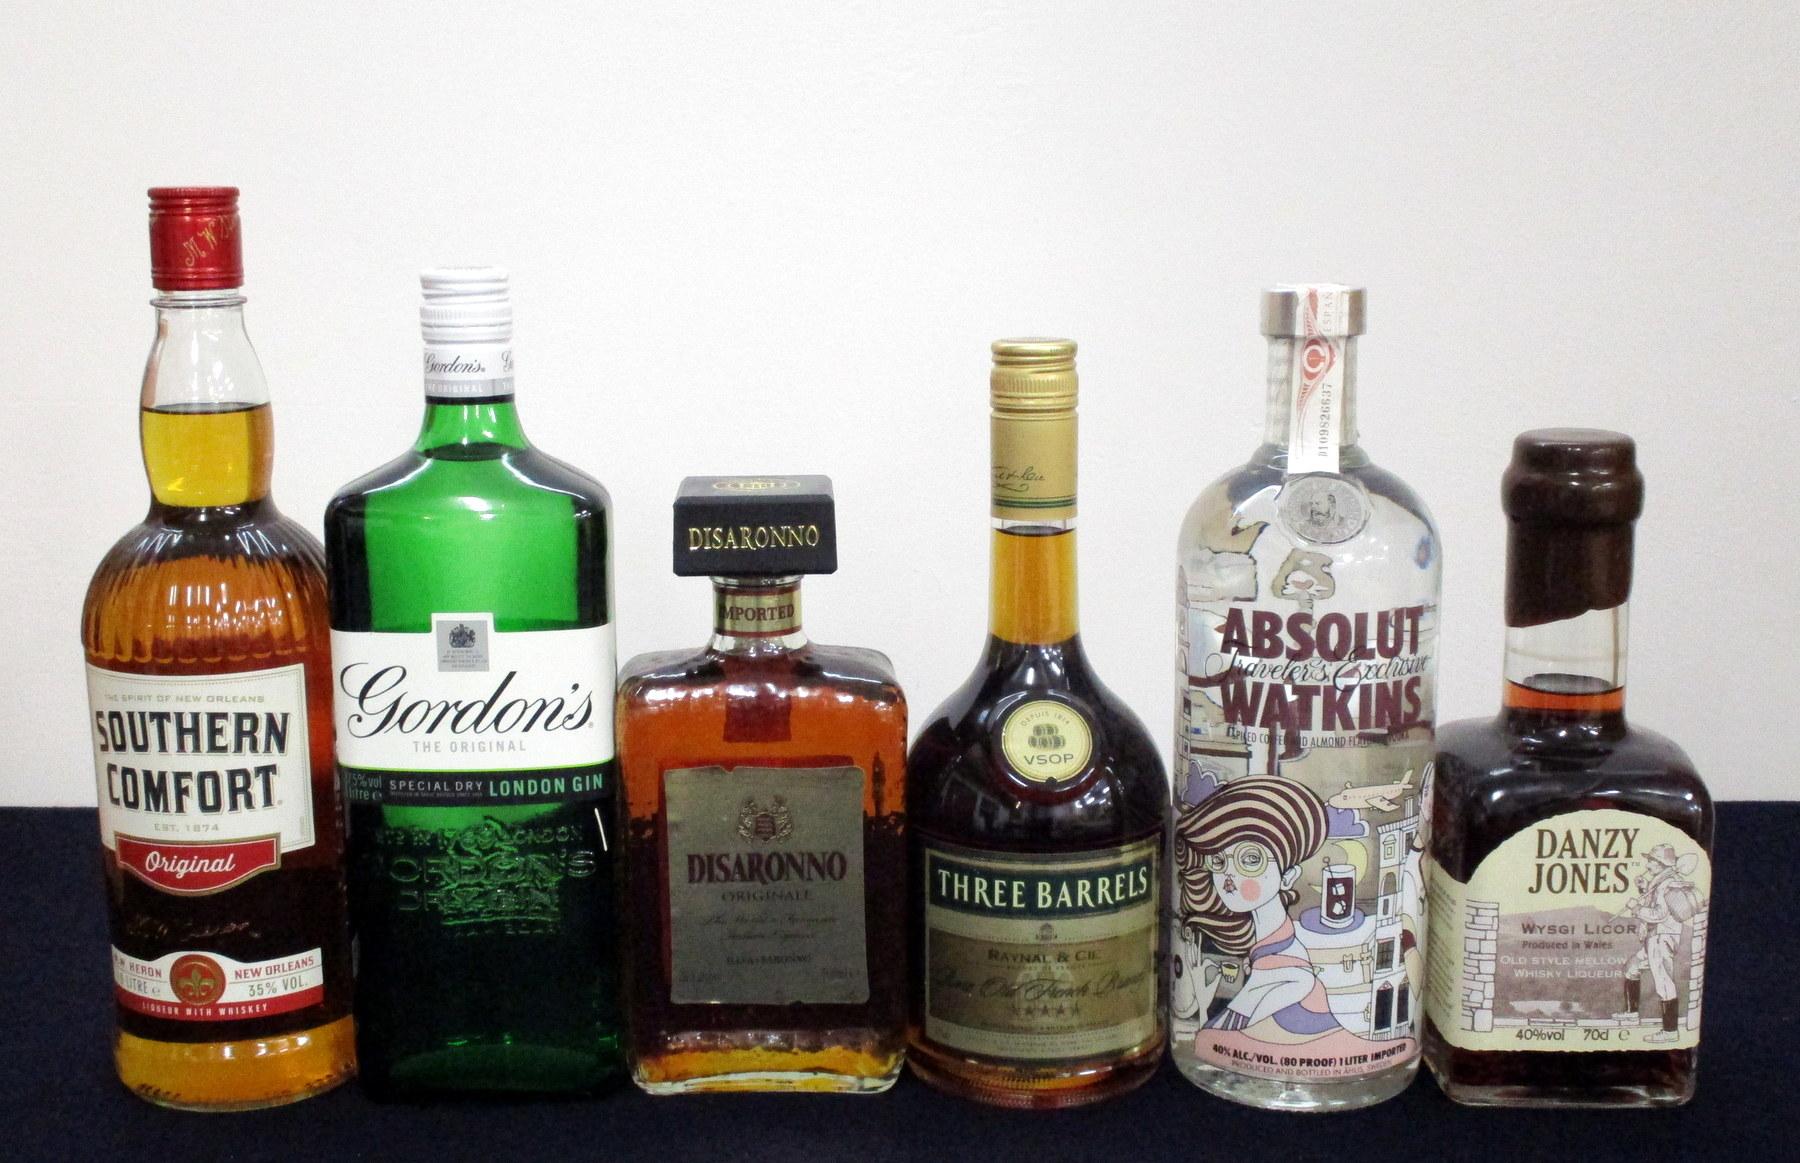 1 litre bt Southern Comfort Original 35% 1 litre bt Gordons Original Gin 37.5% 1 500-ml bt Disaronno